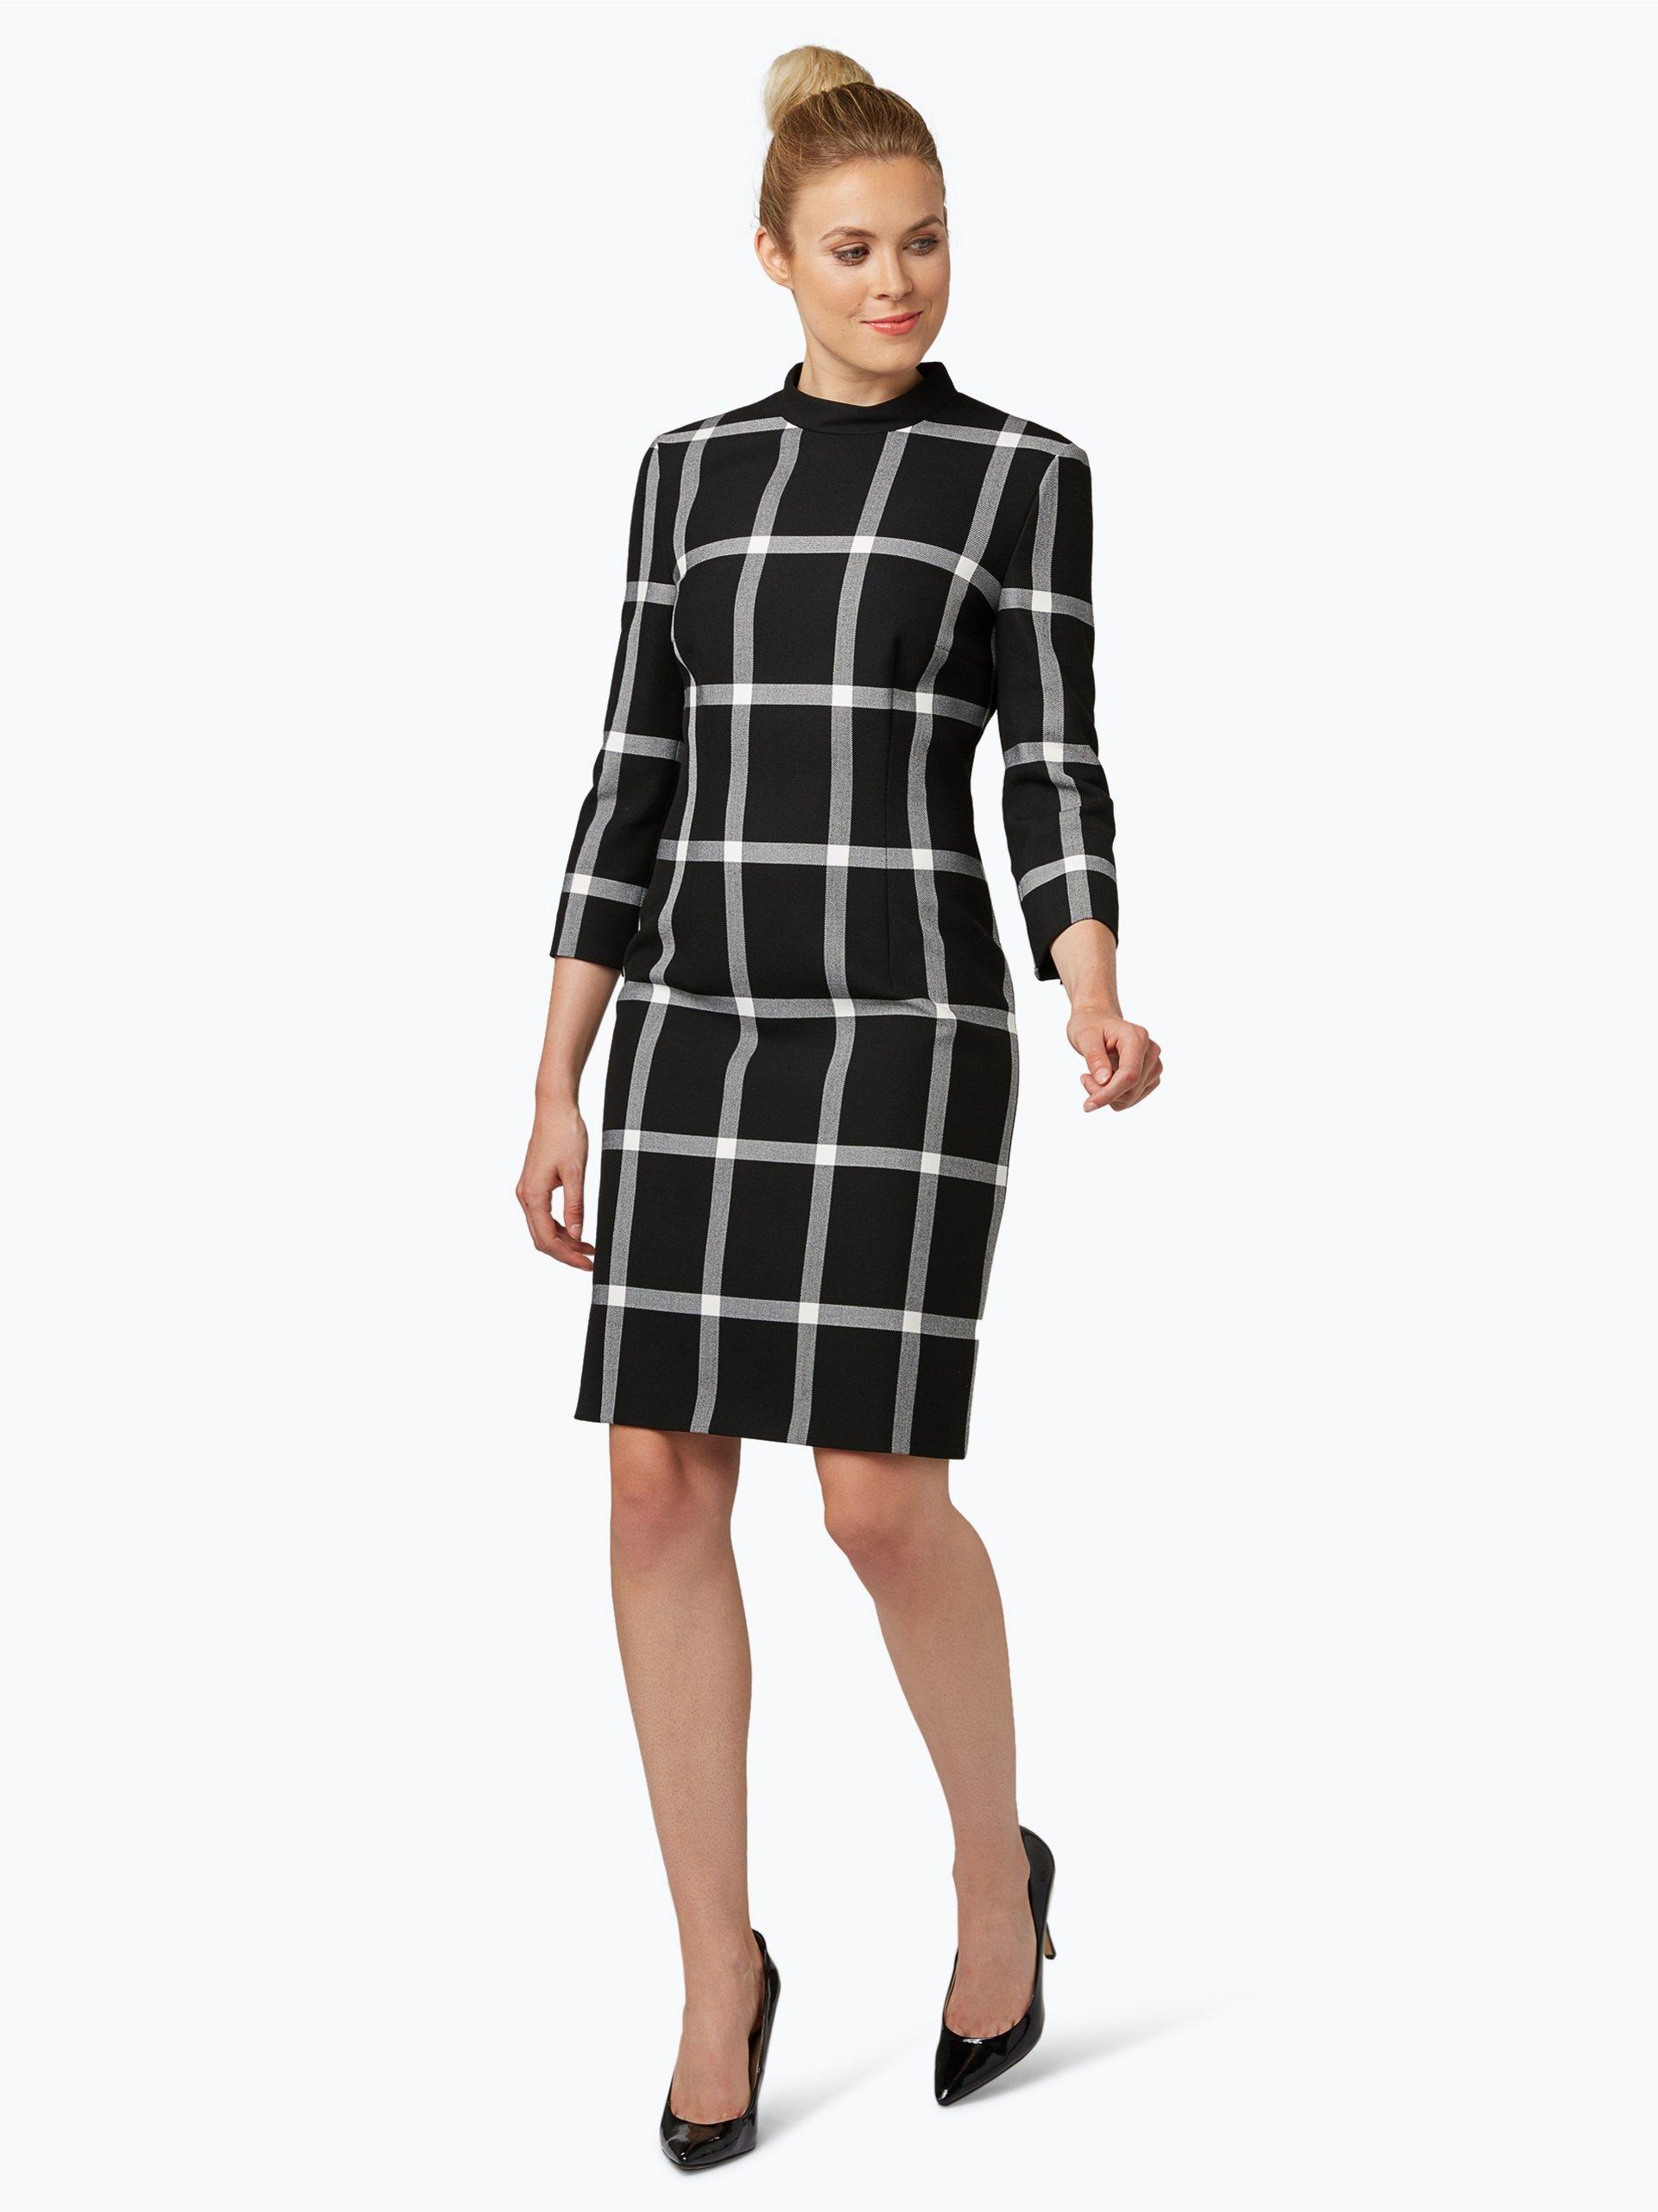 Damen kleid 36